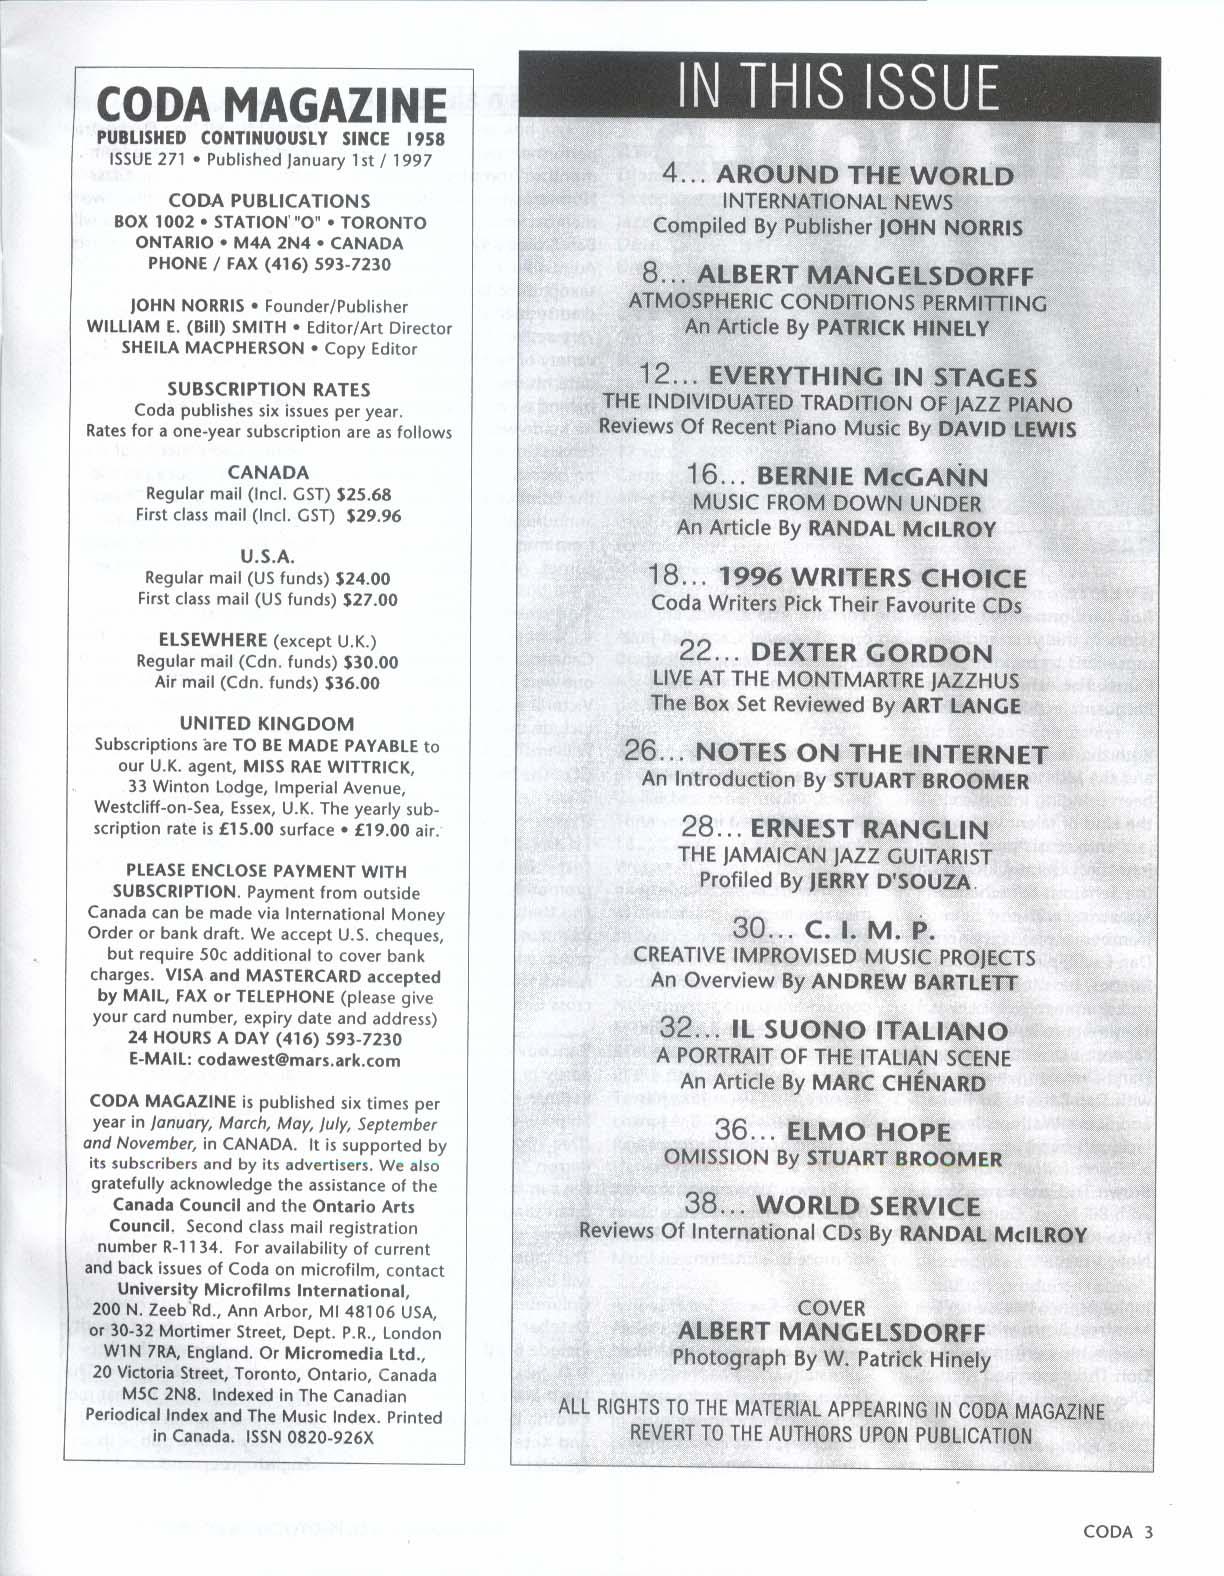 CODA #271 Albert Mangelsdorff Ernest Ranglin Bernie McGann Elmo Hope + 1-2 1997